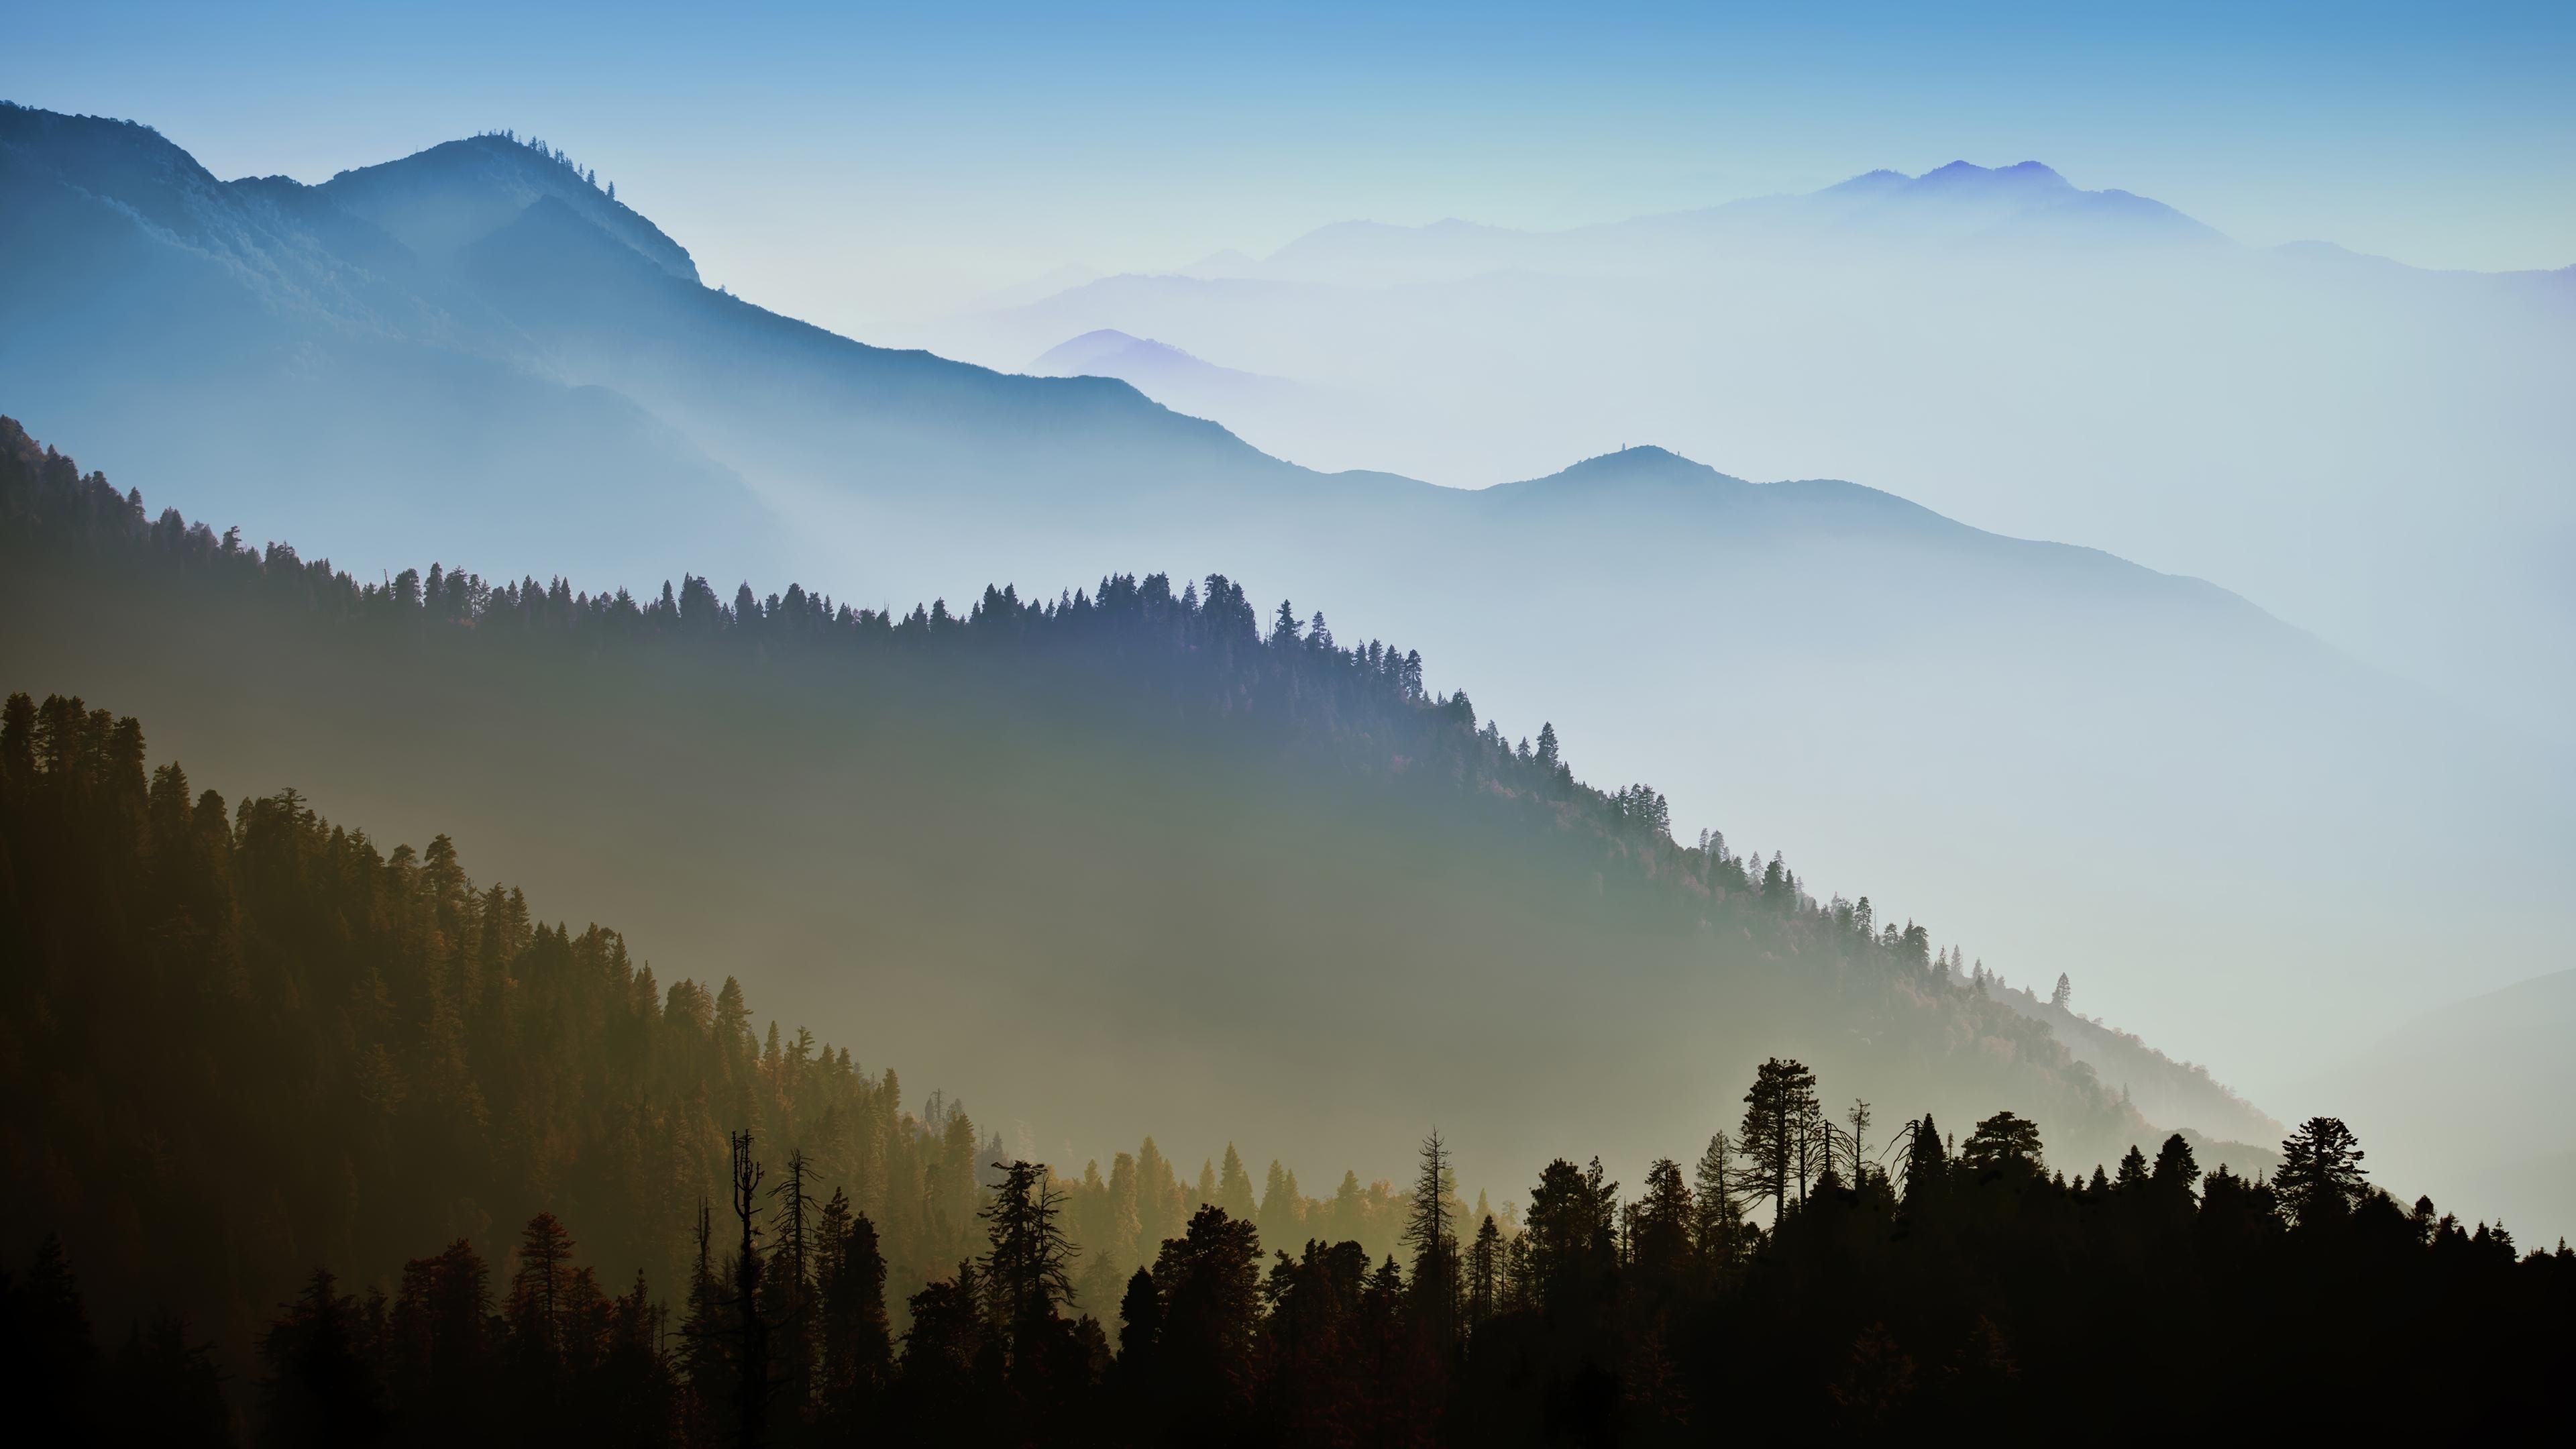 Simple Wallpaper Mountain Windows Vista - gXCVQ9  Photograph_172553.jpg